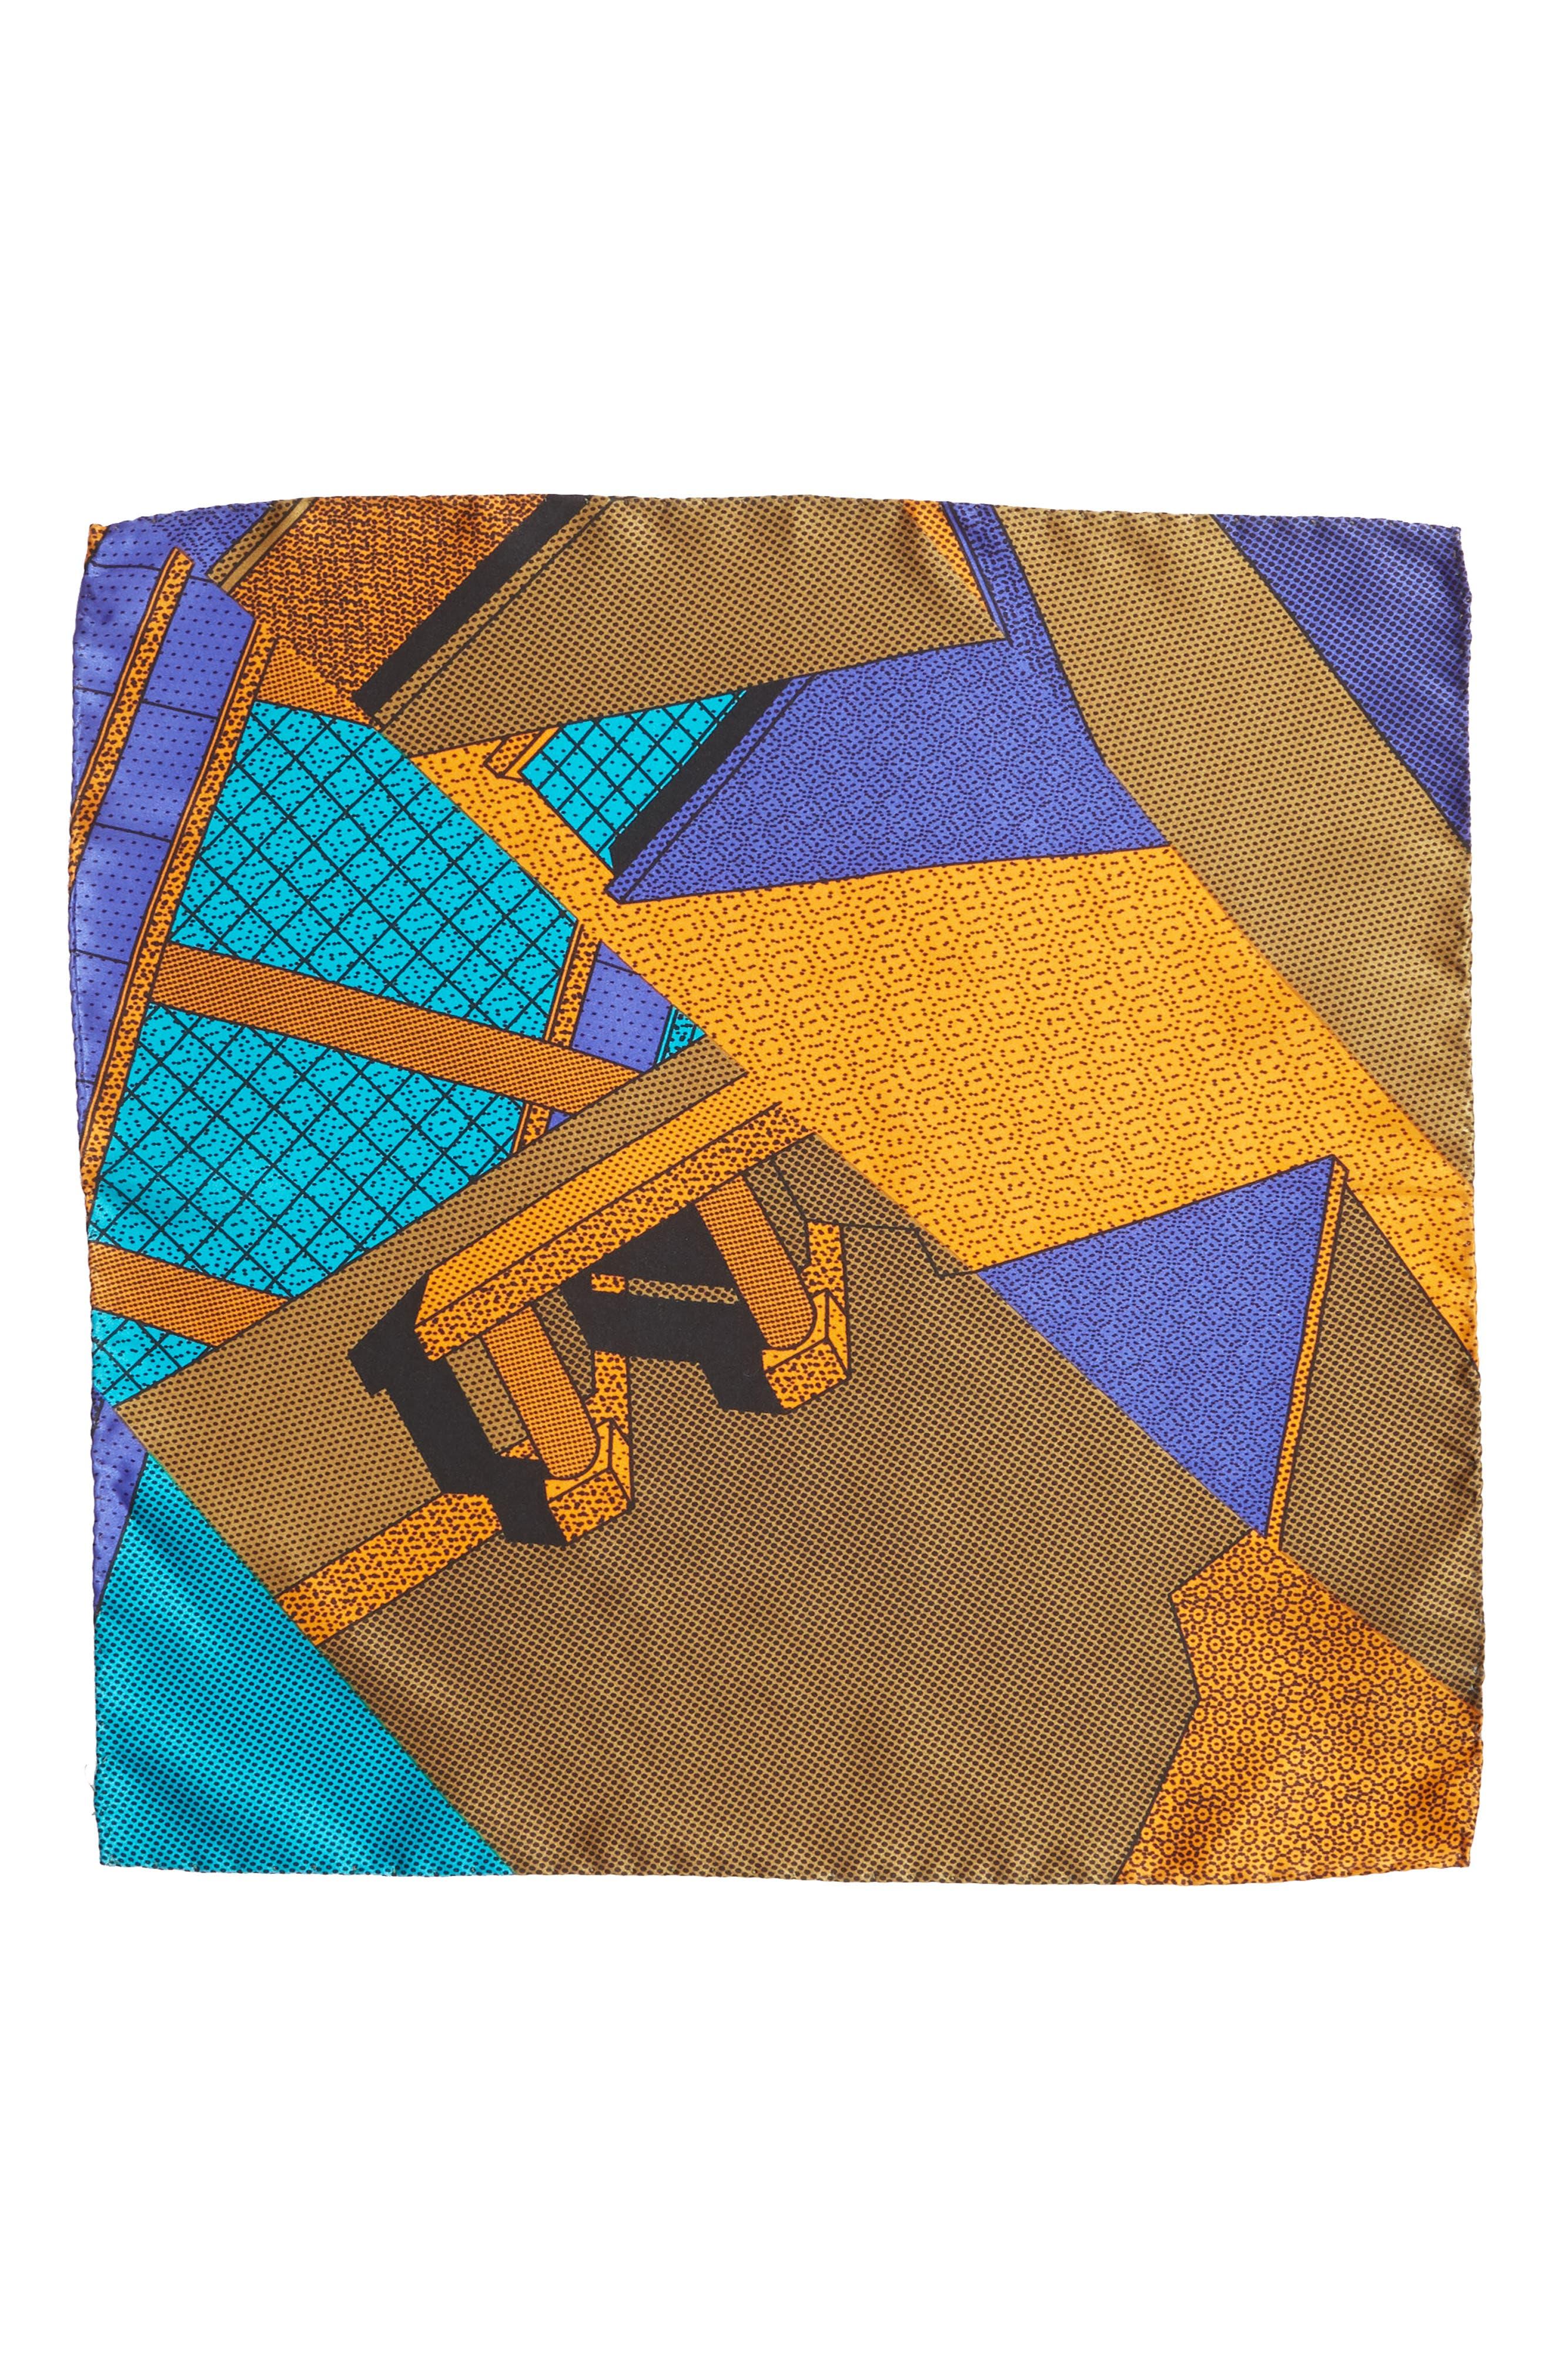 MEMPHIS Milano Pochette Silk Pocket Square,                             Alternate thumbnail 2, color,                             TEAL/ ORANGE